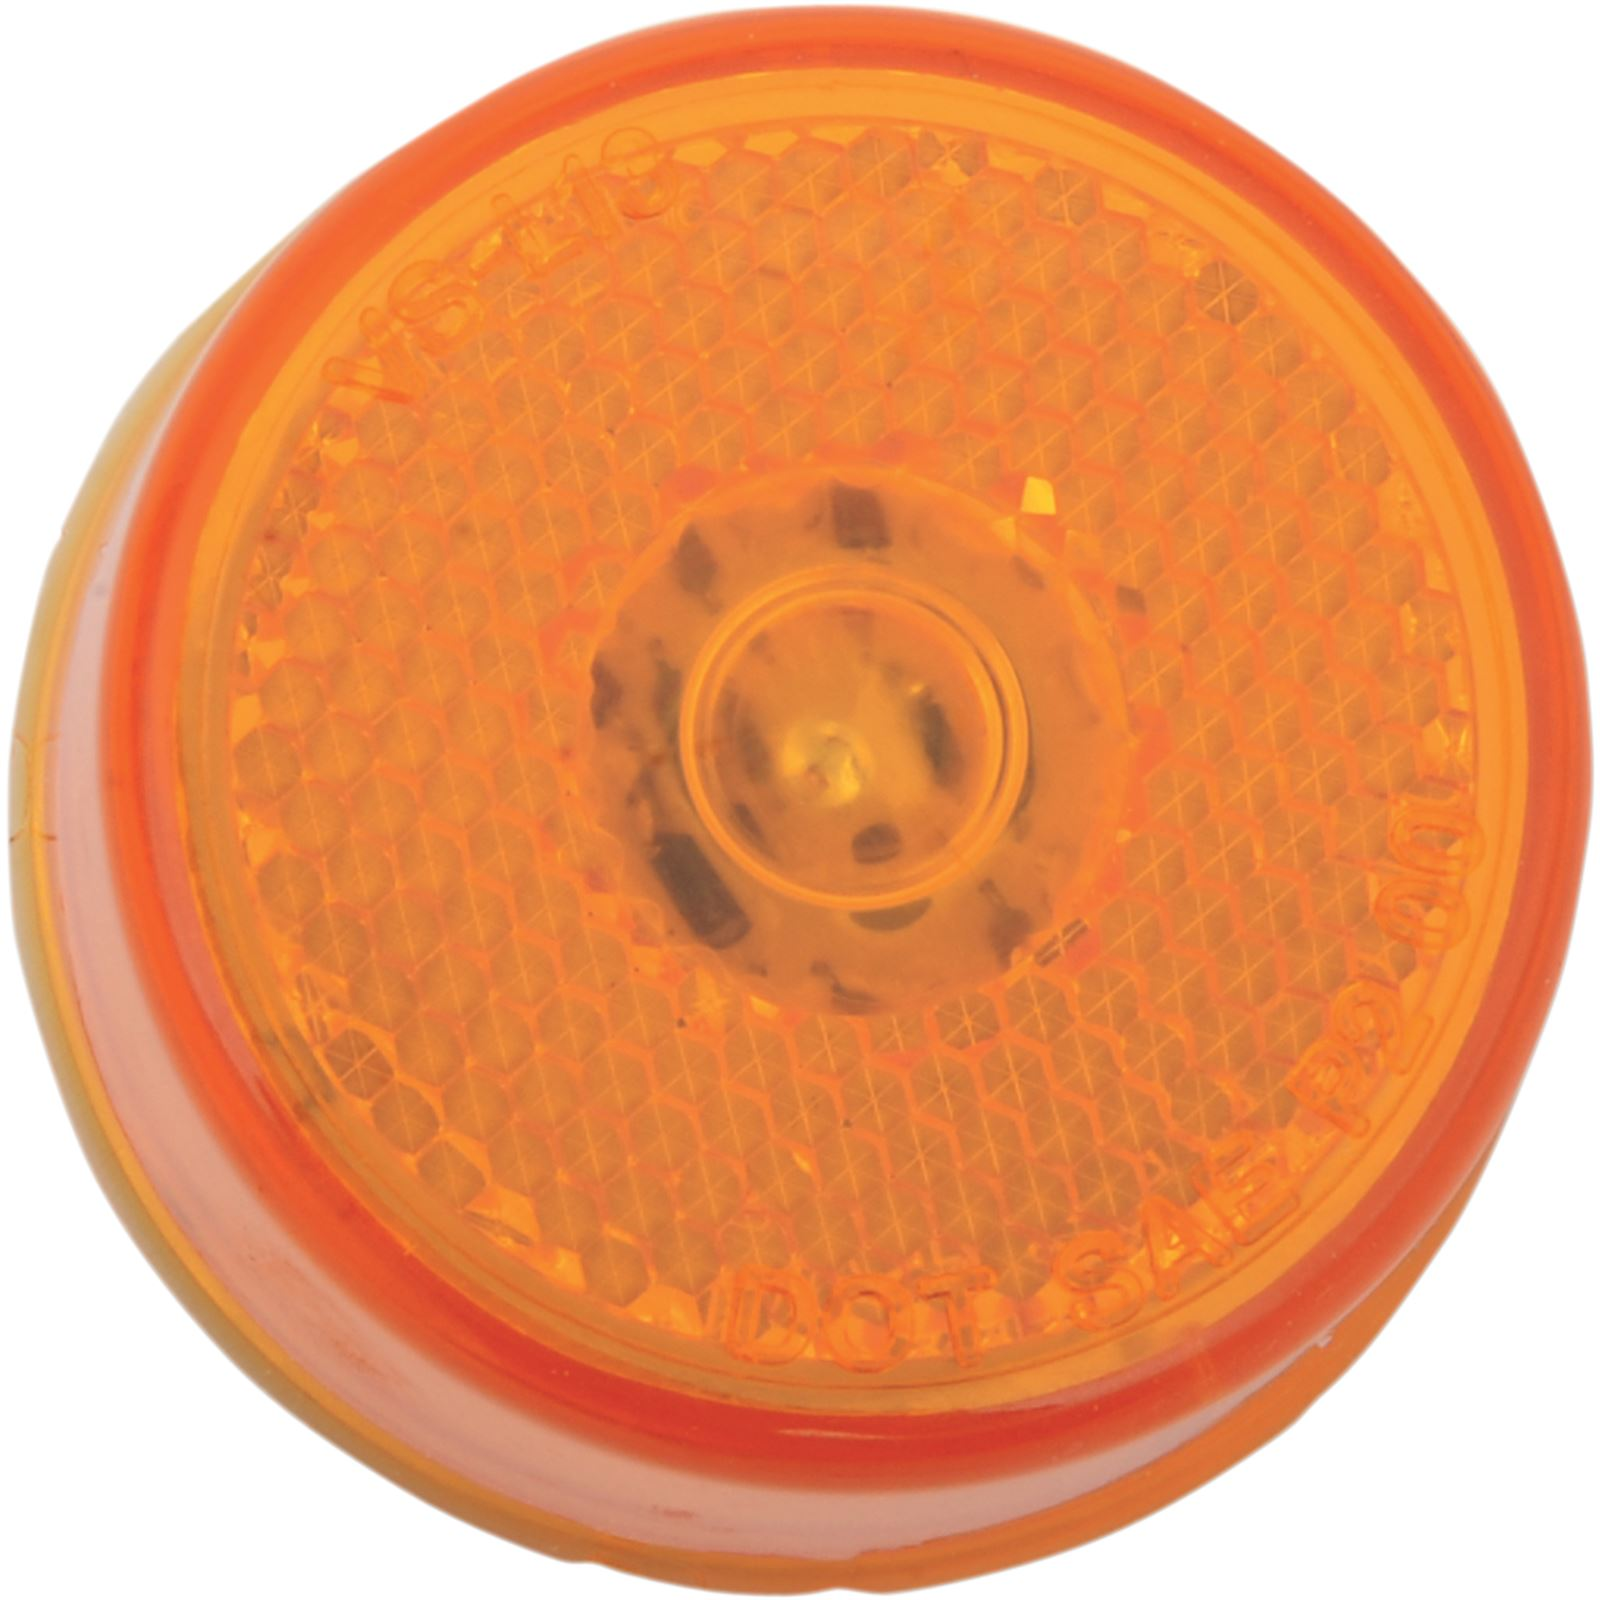 "Brite-Lites 2"" Round LED Light - Amber"